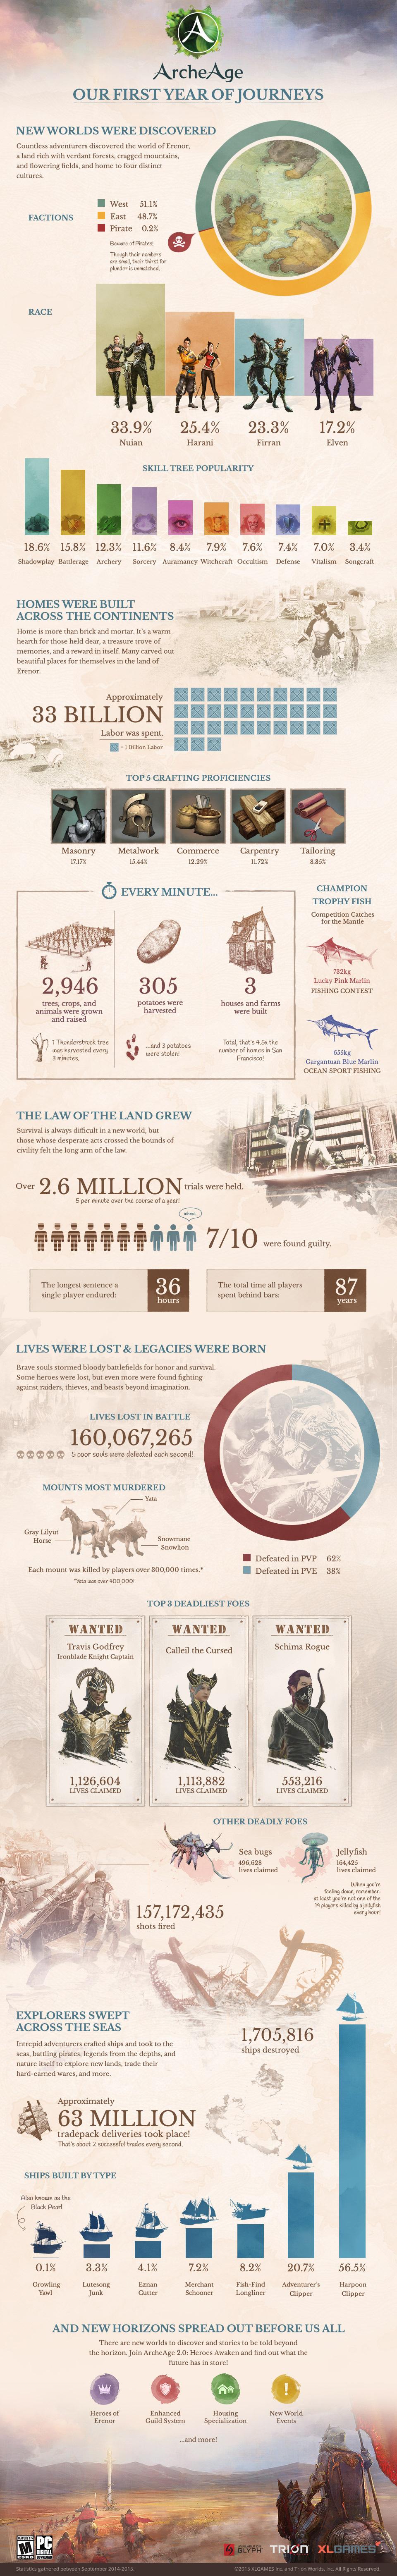 aa_infographic.jpg